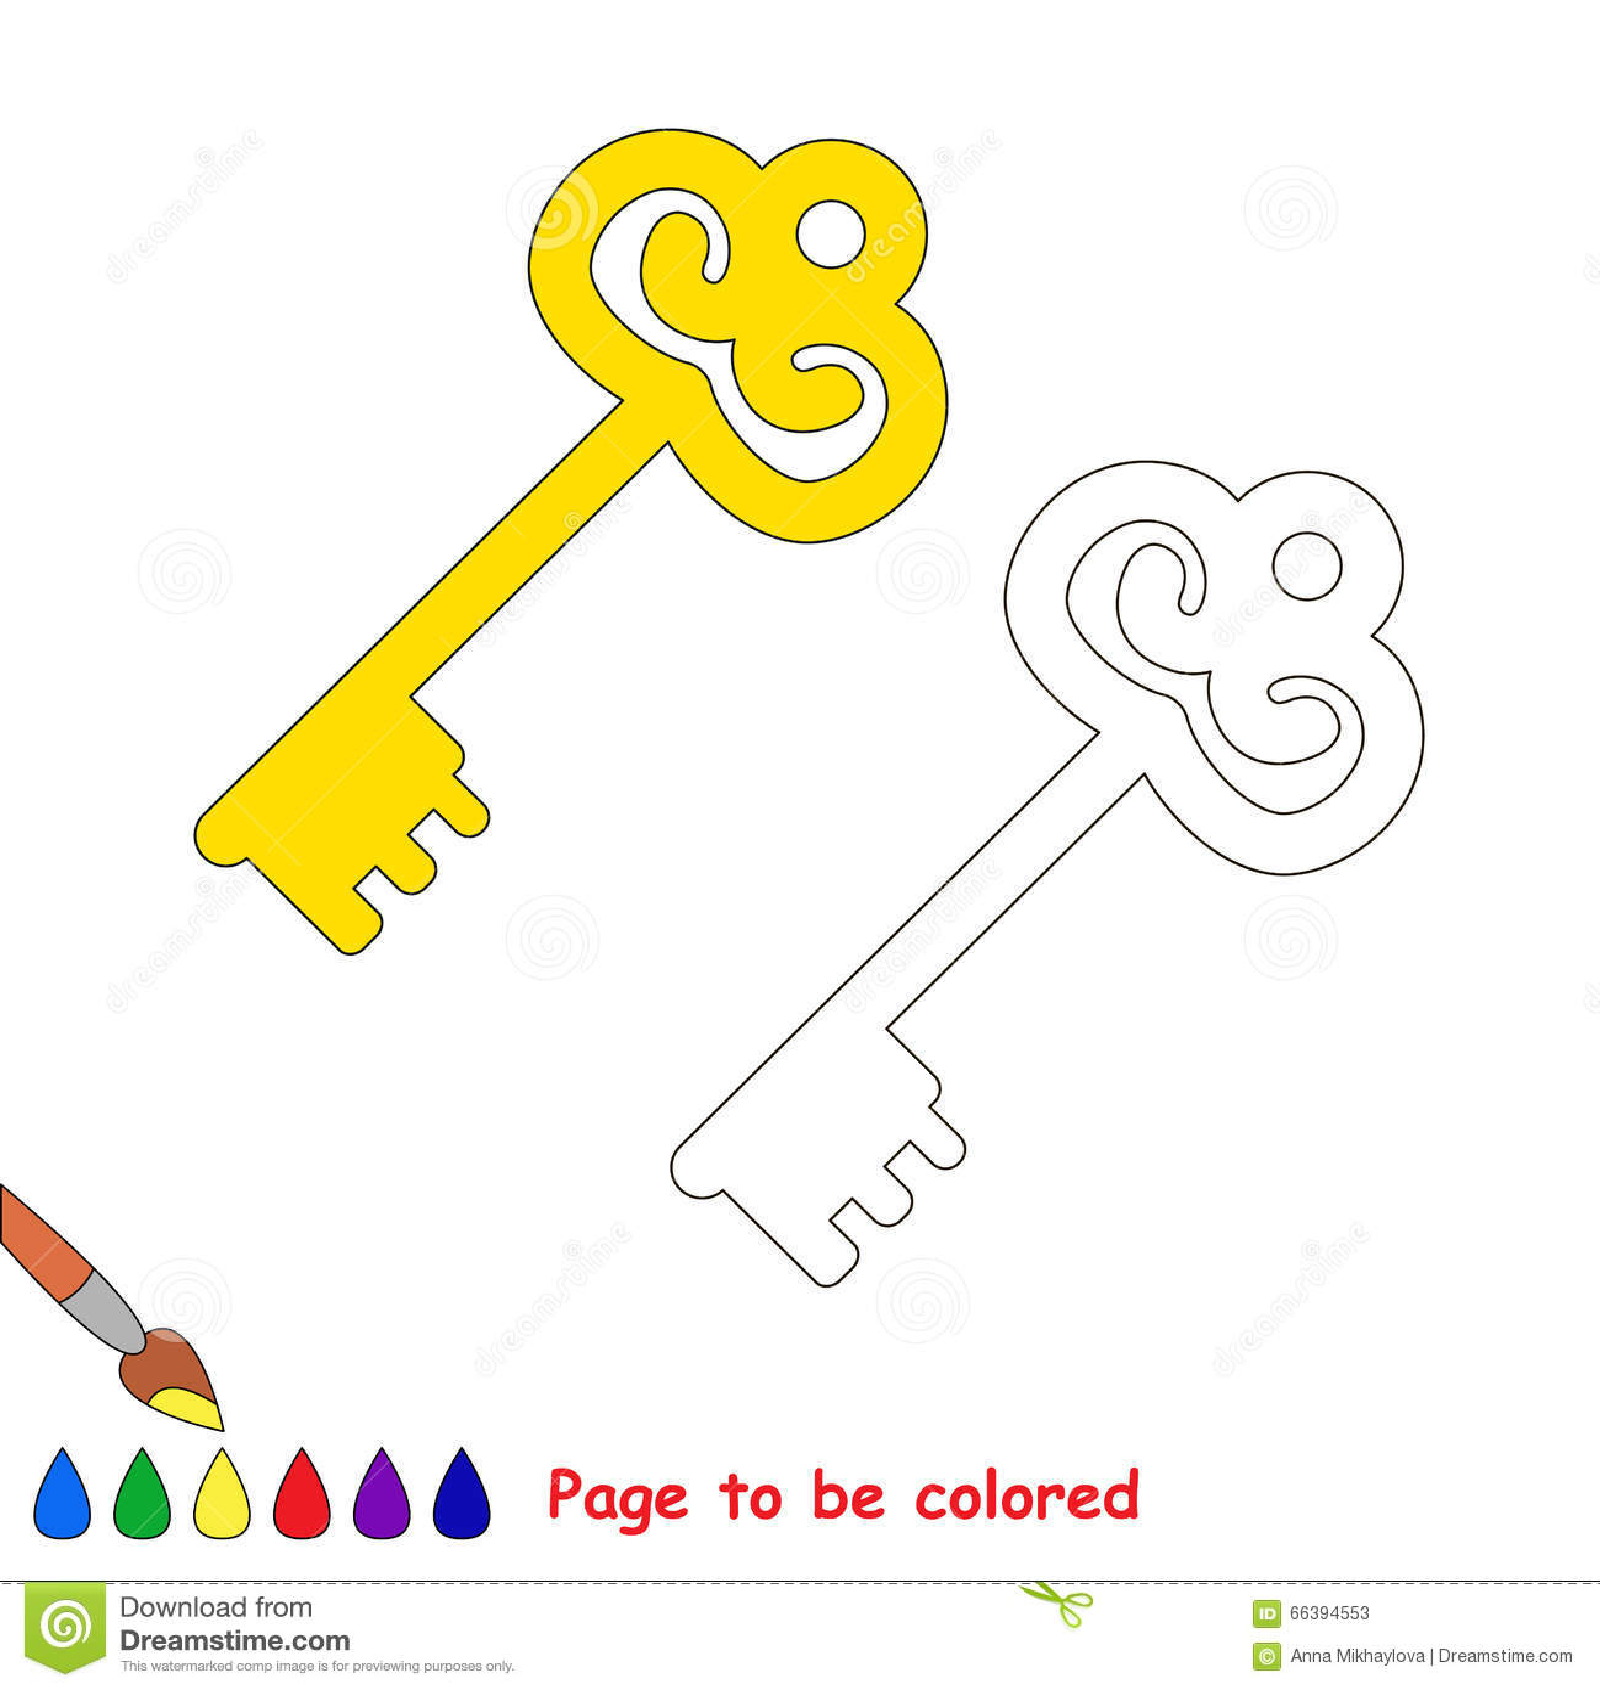 Royalty Free Vector Download Golden Key Cartoon